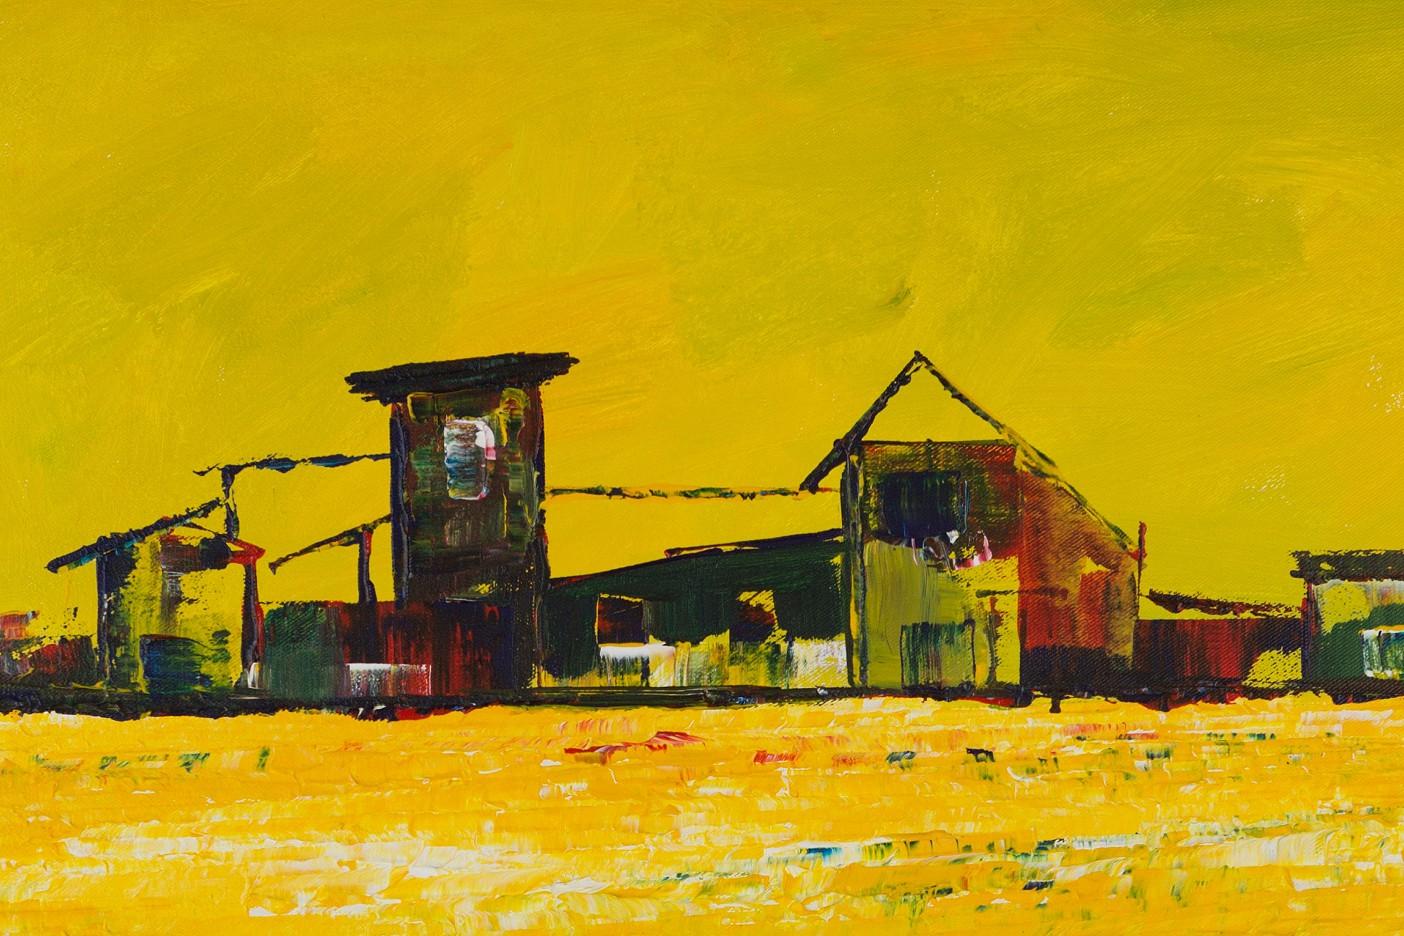 Gelbe Landschaft